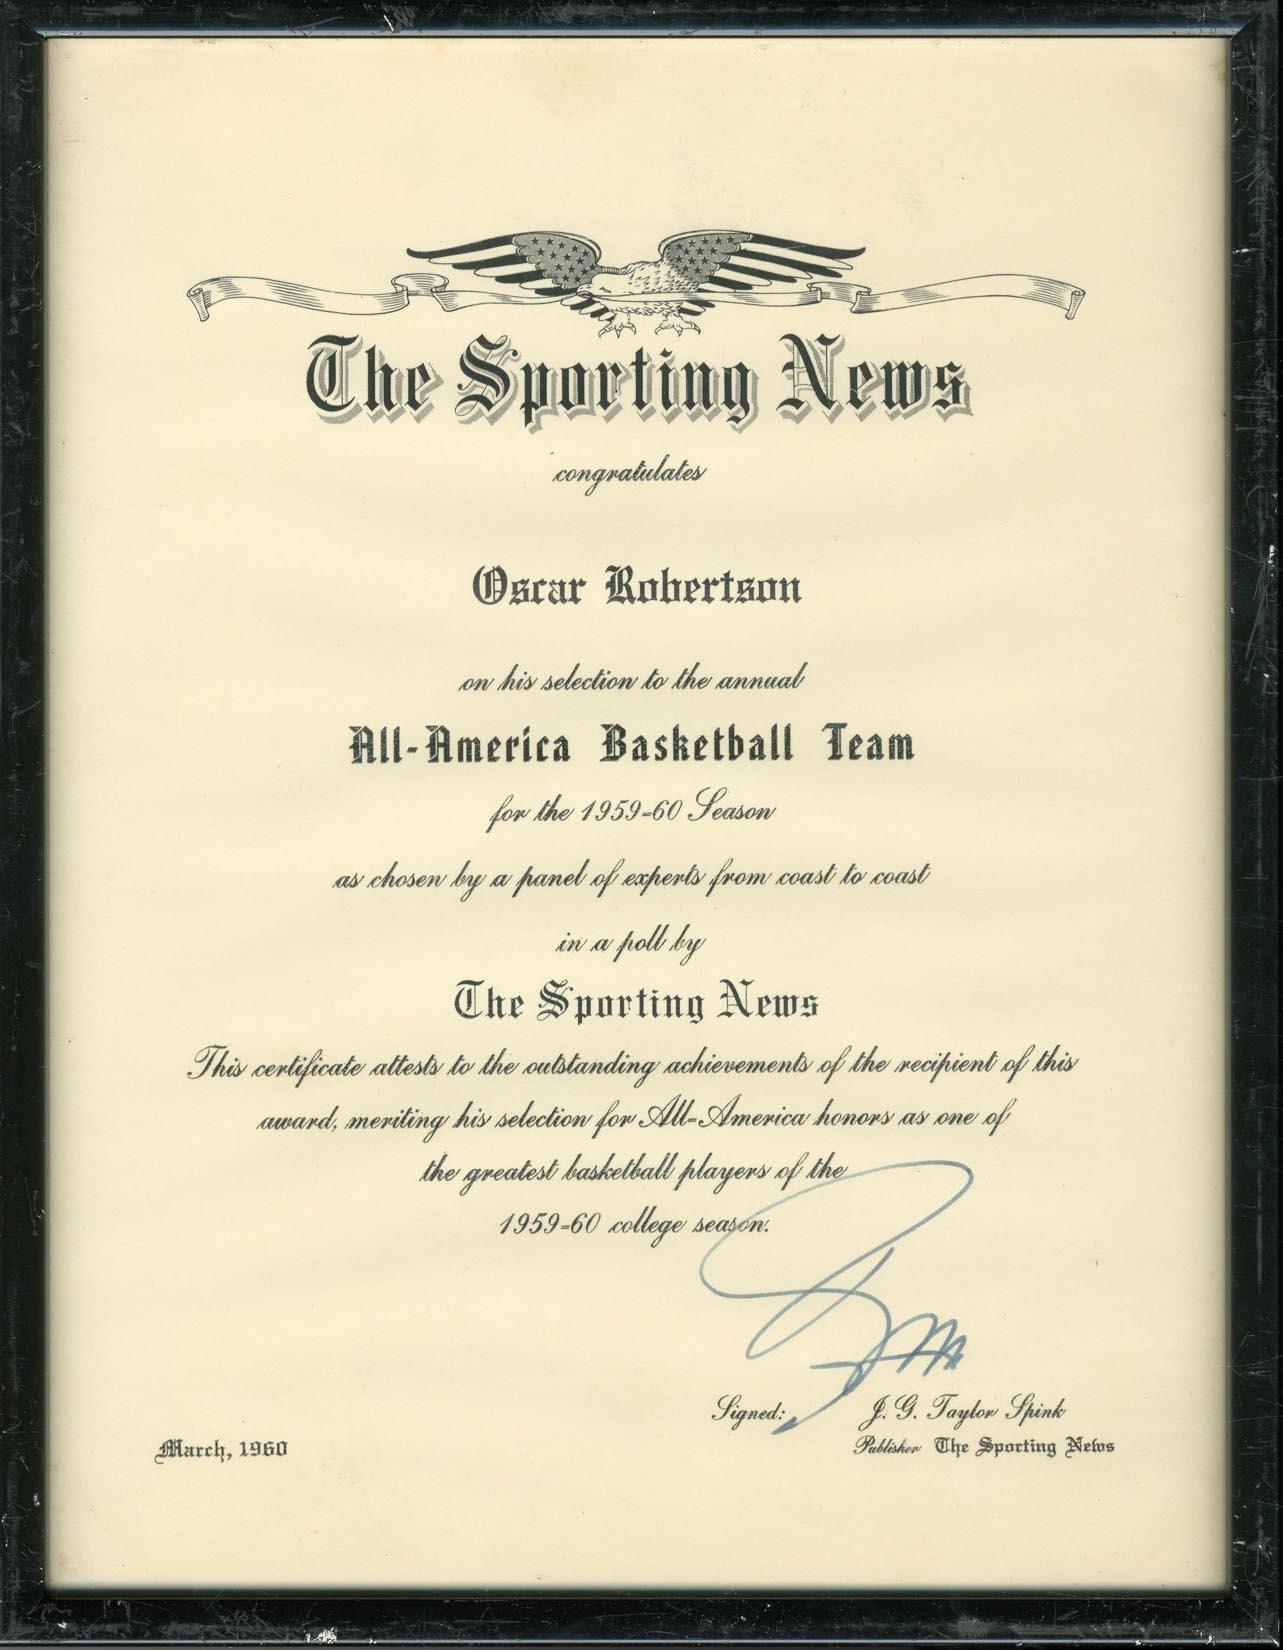 The Oscar Robertson Collection - 2018 Invitational